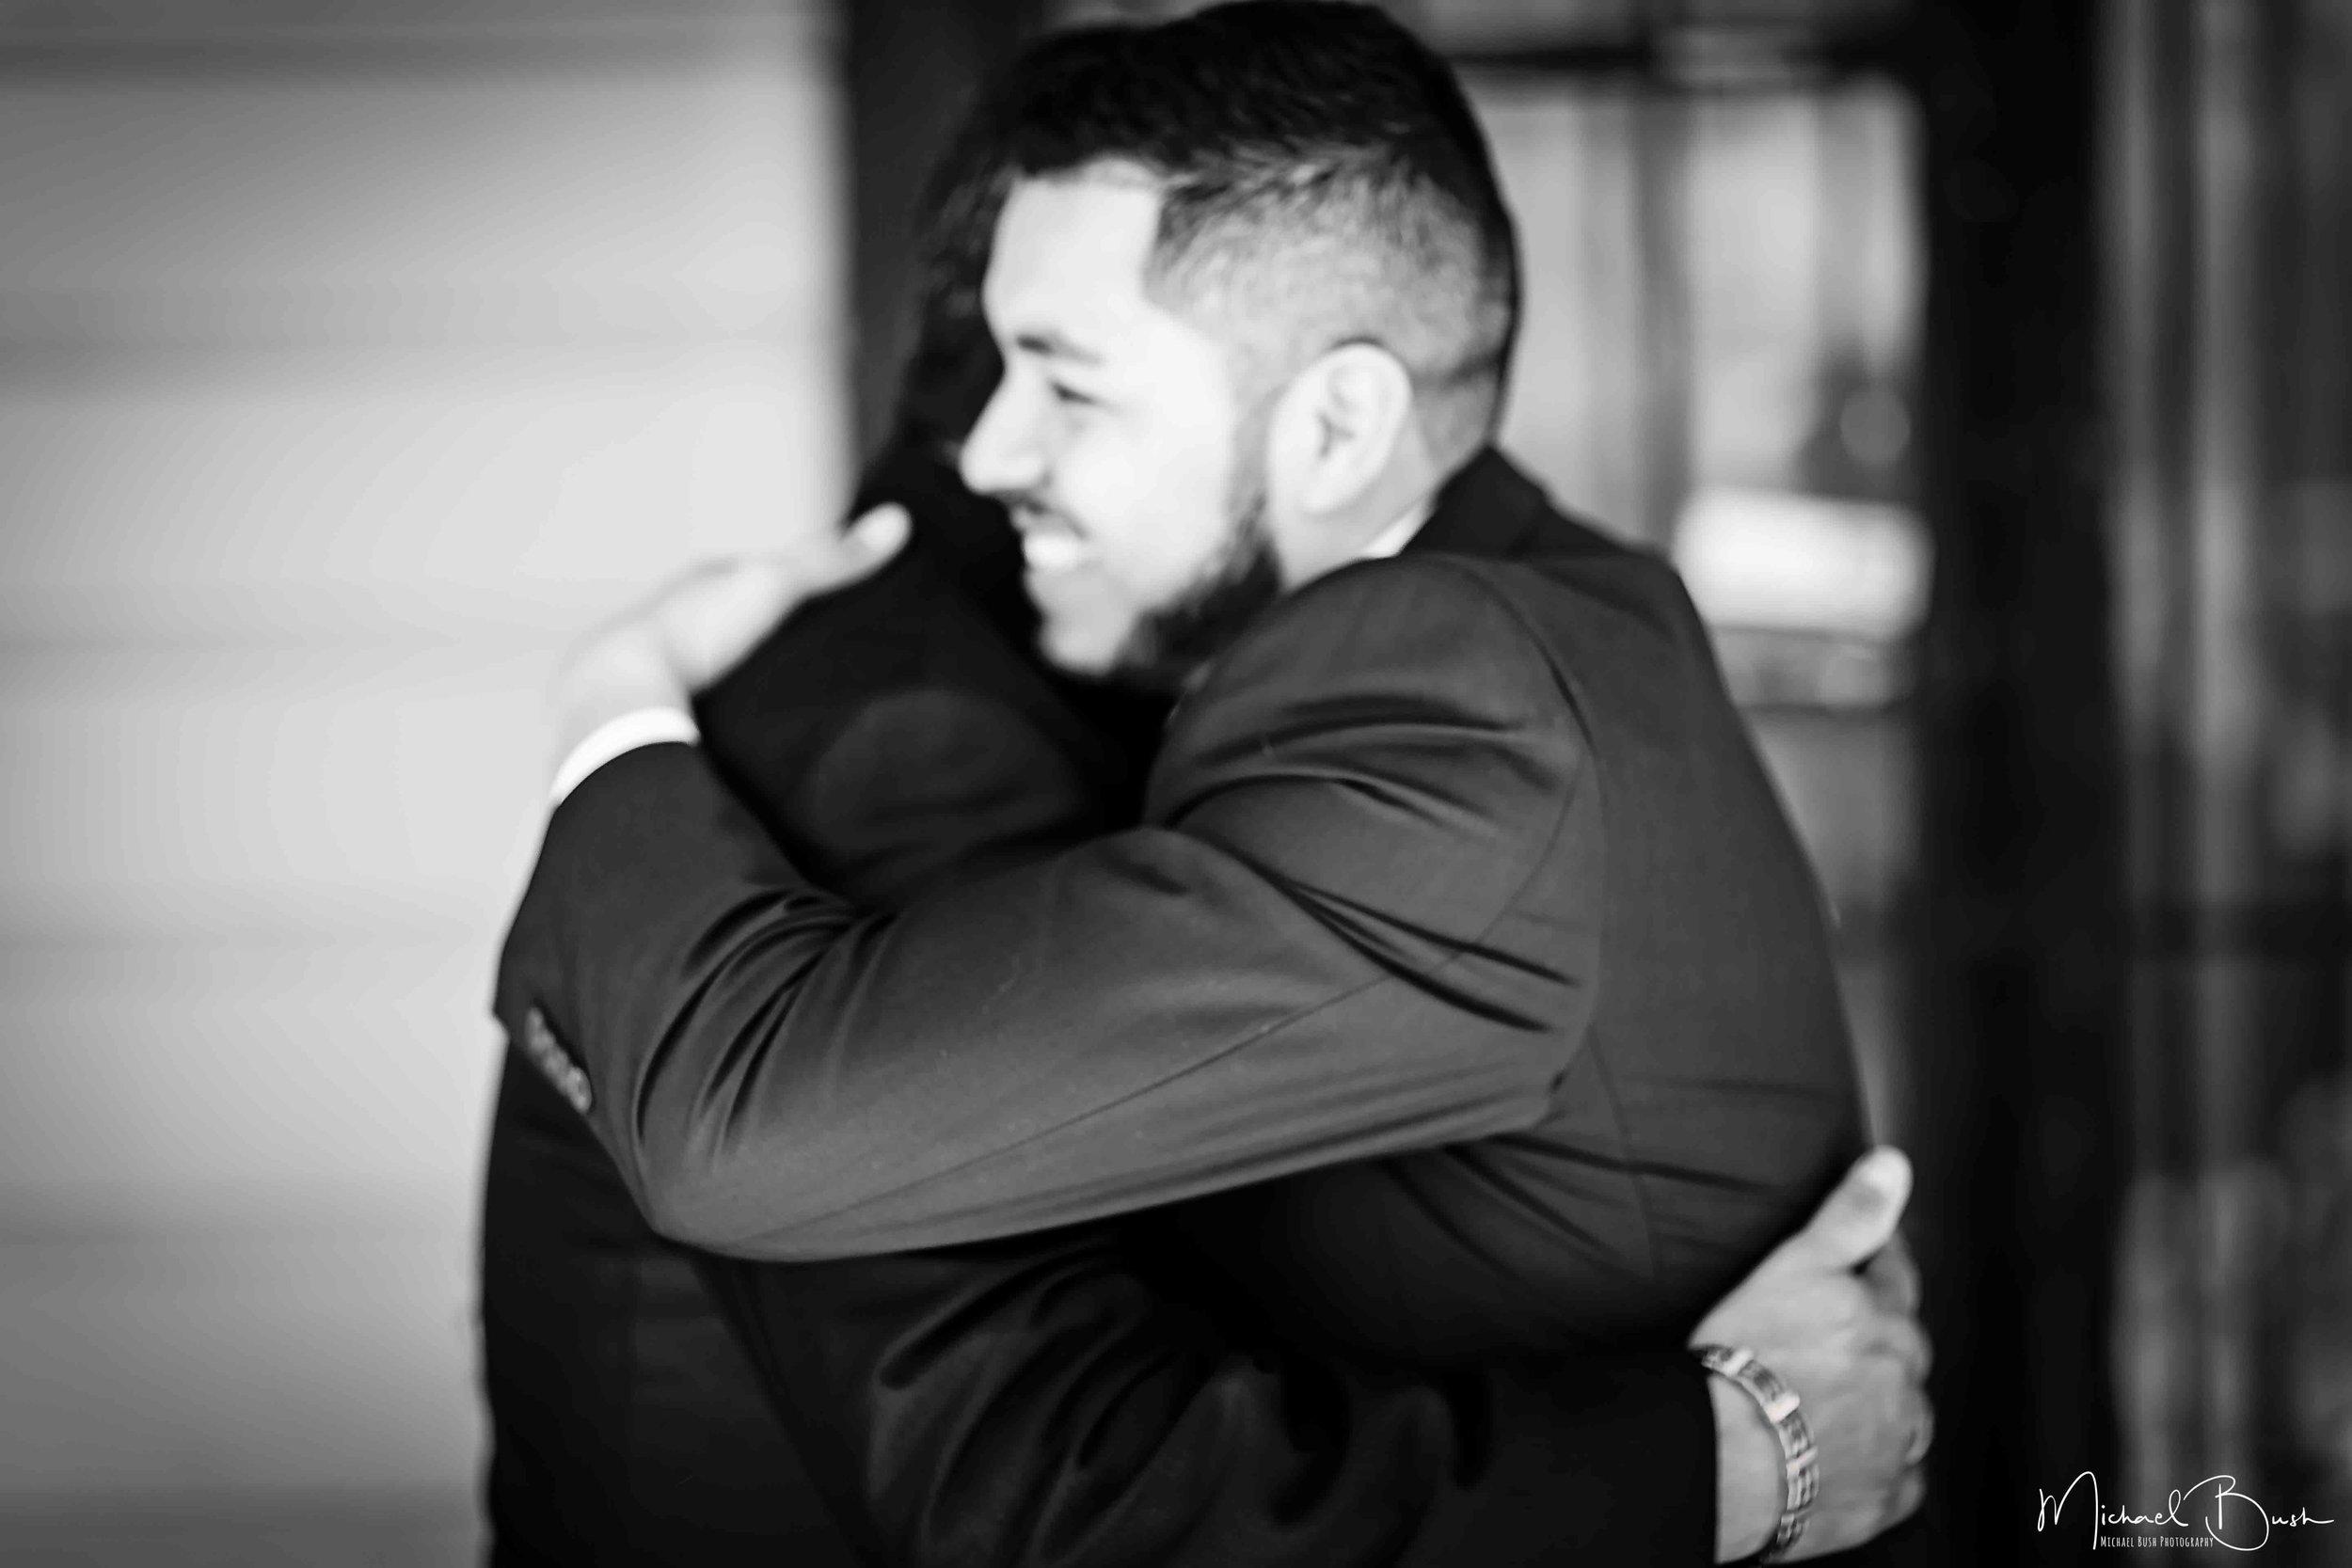 Wedding-Details-Groom-Fort Worth-b&w-Getting Ready-bestman-love-hugs.jpg